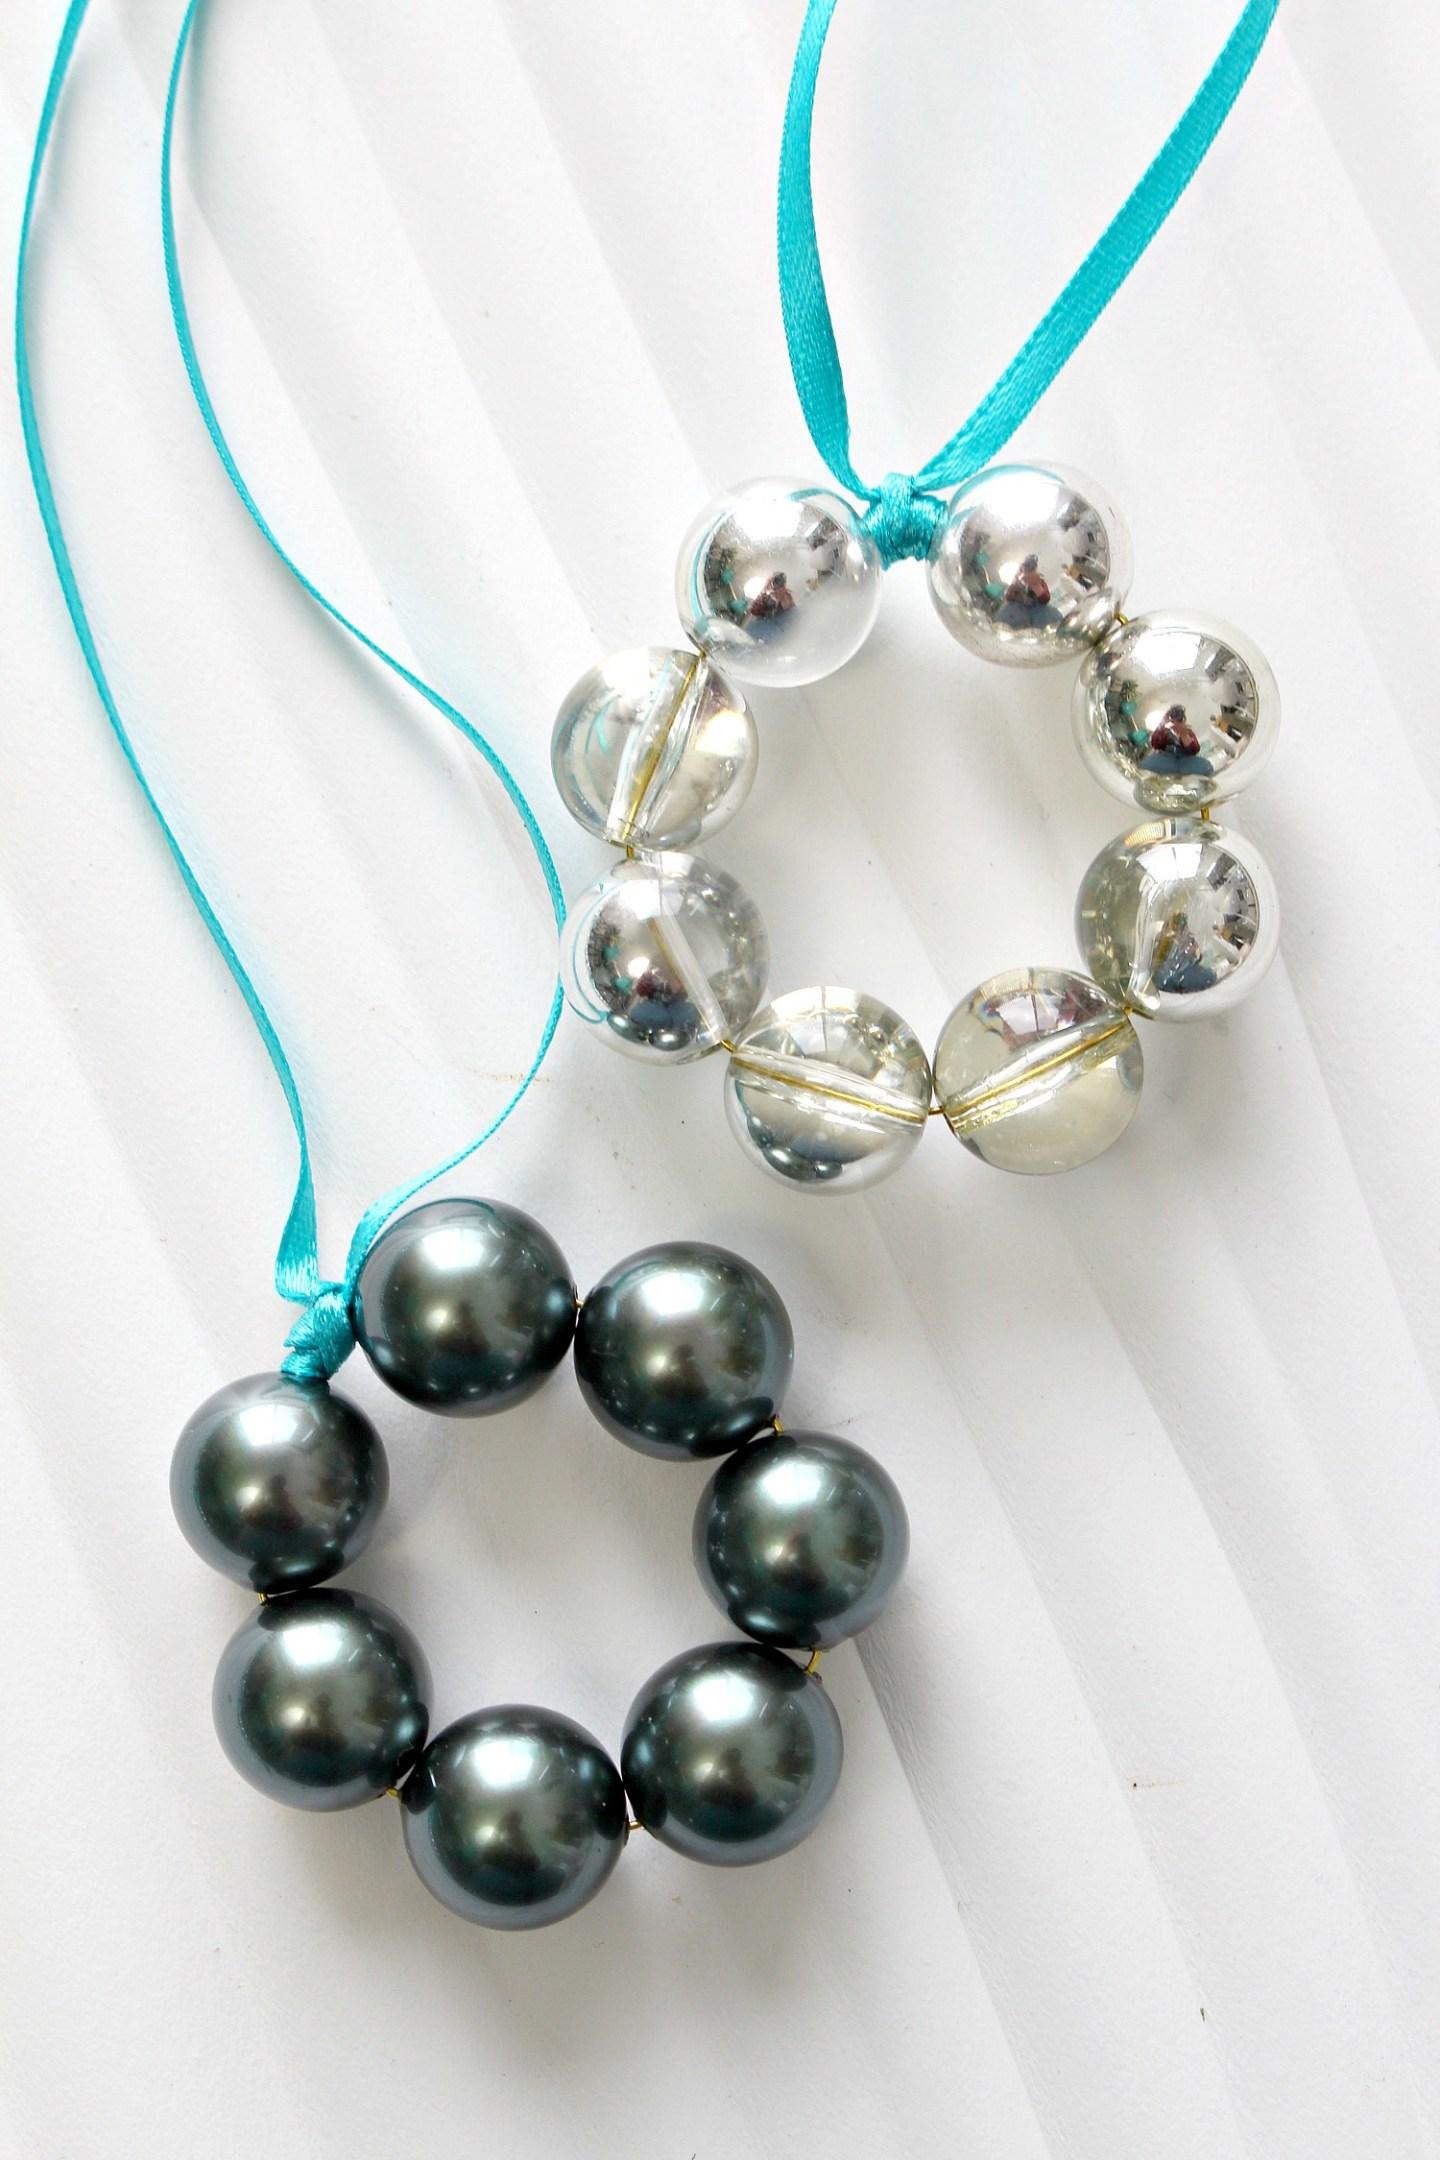 DIY Glass Bead Christmas Ornaments